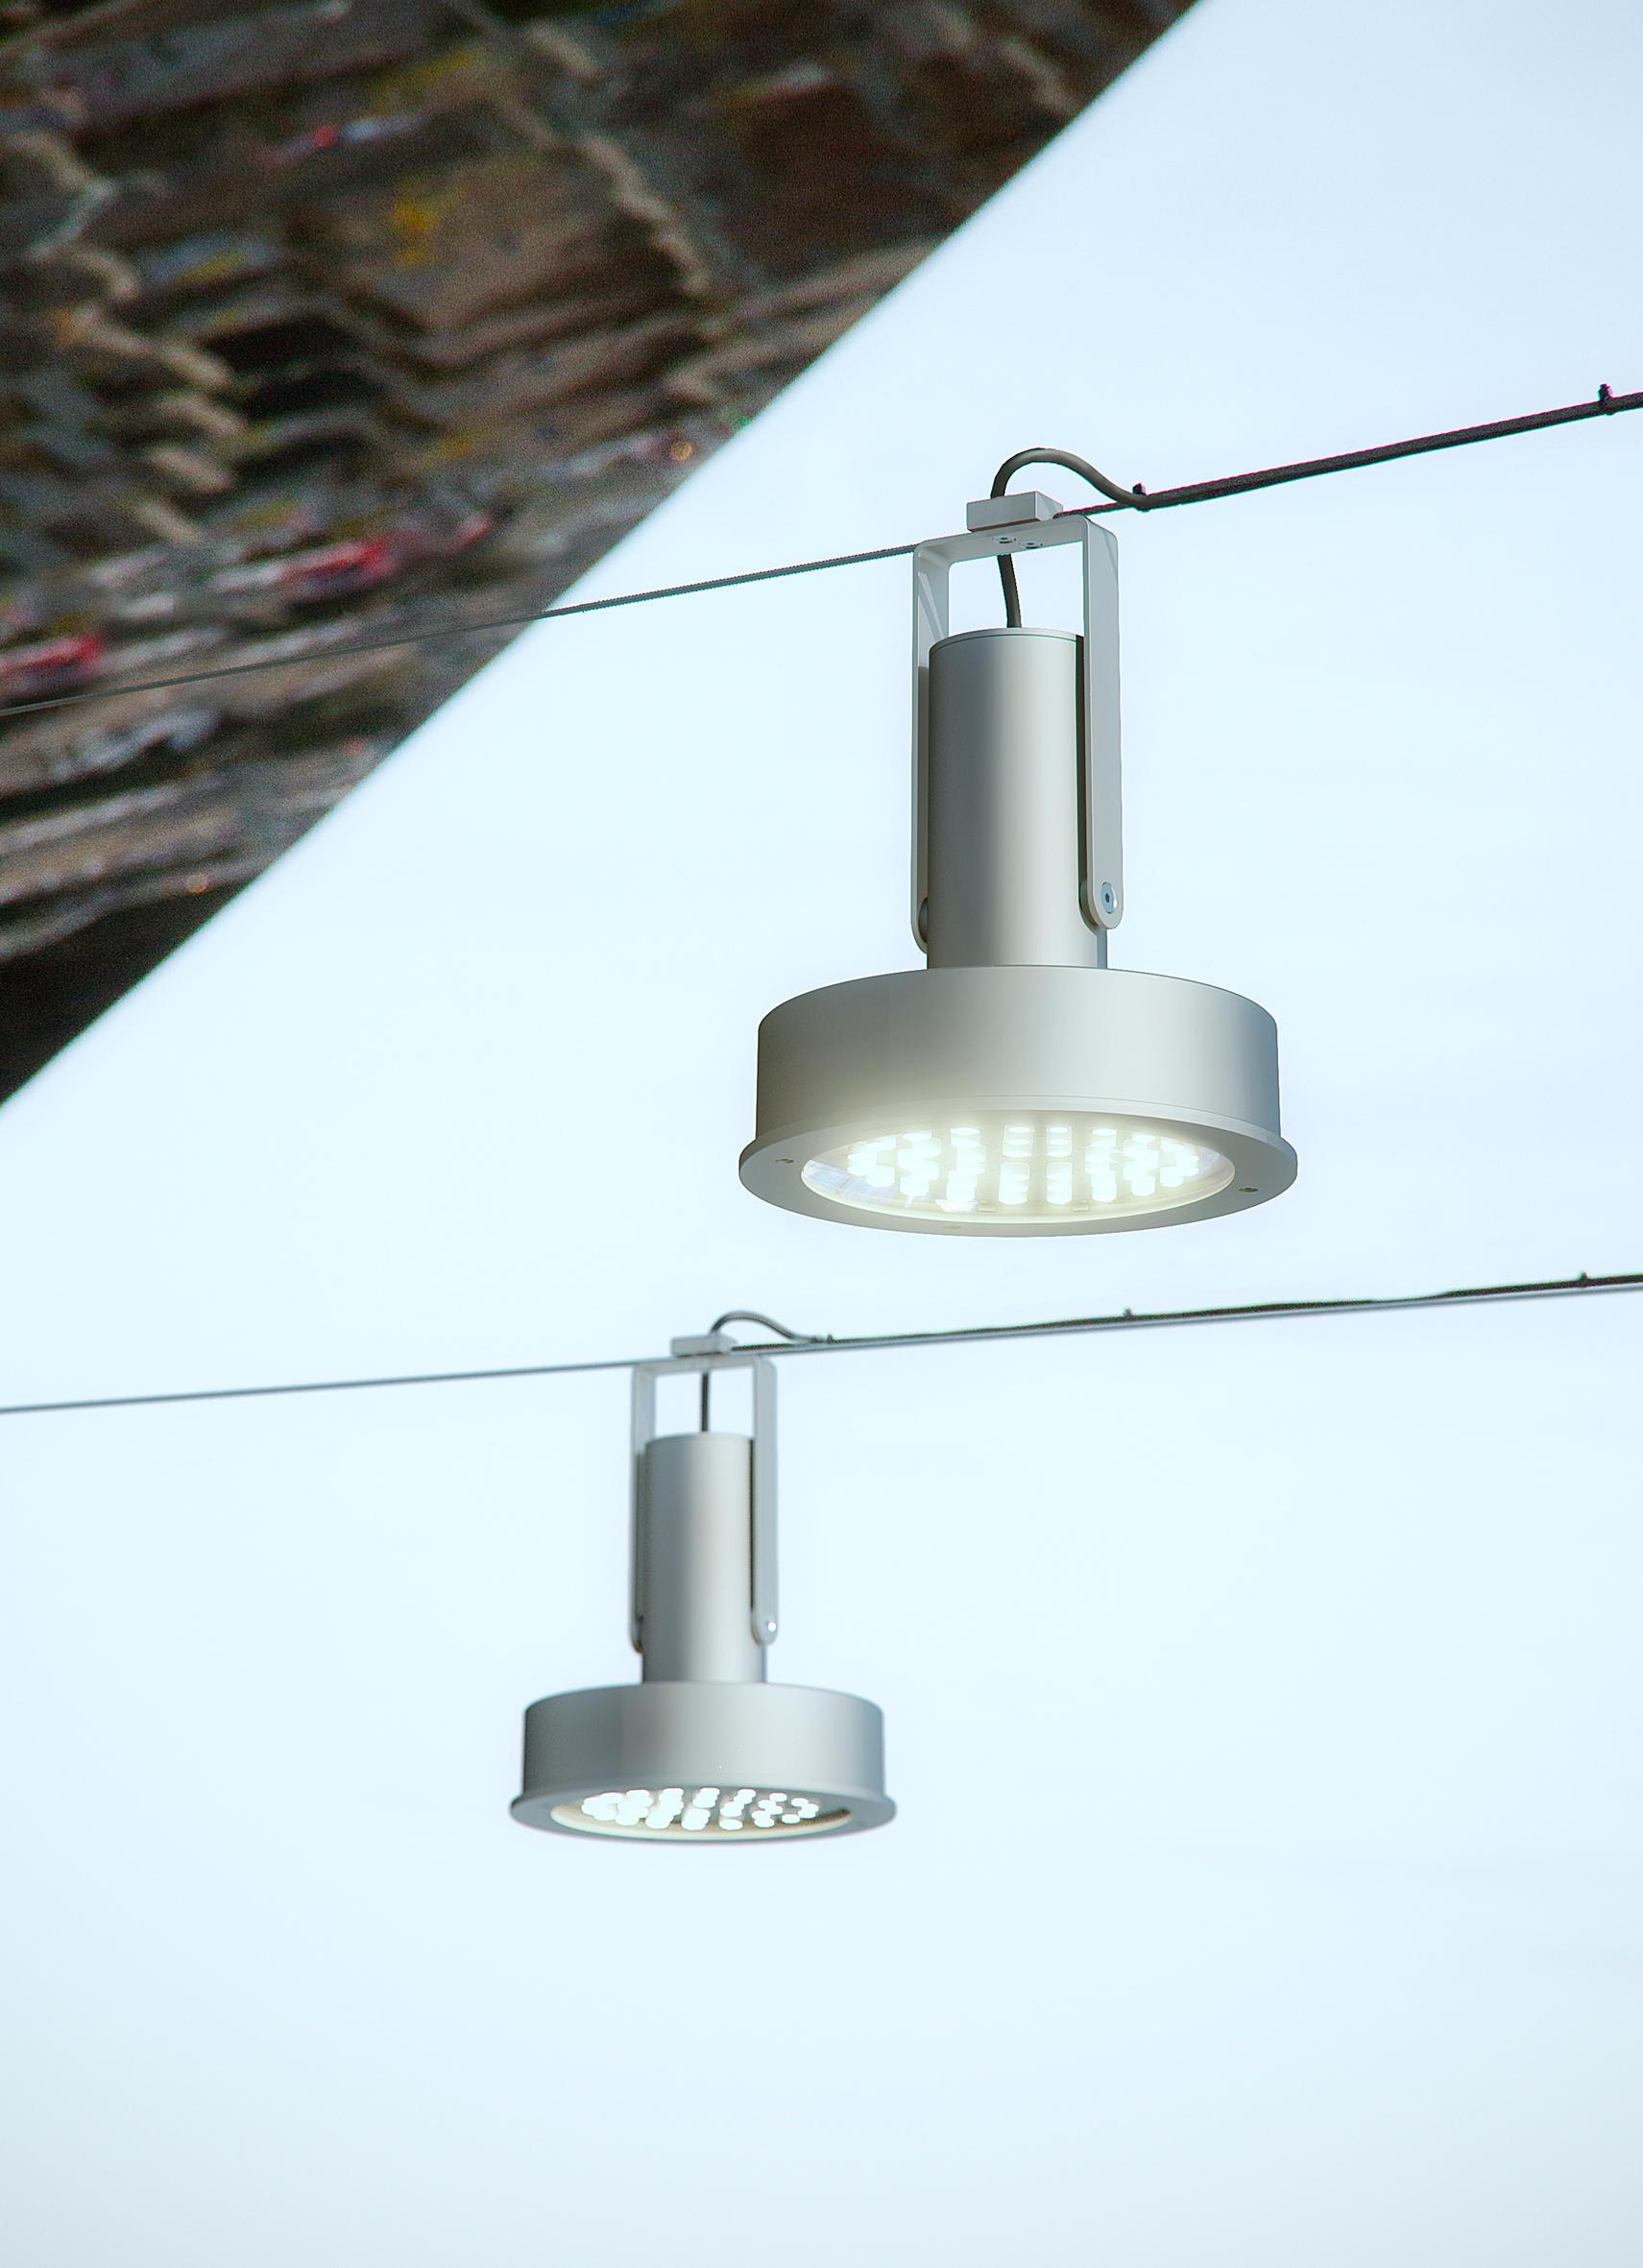 Arne catenaria iluminaci n led de santa cole for Distribuidor roca barcelona